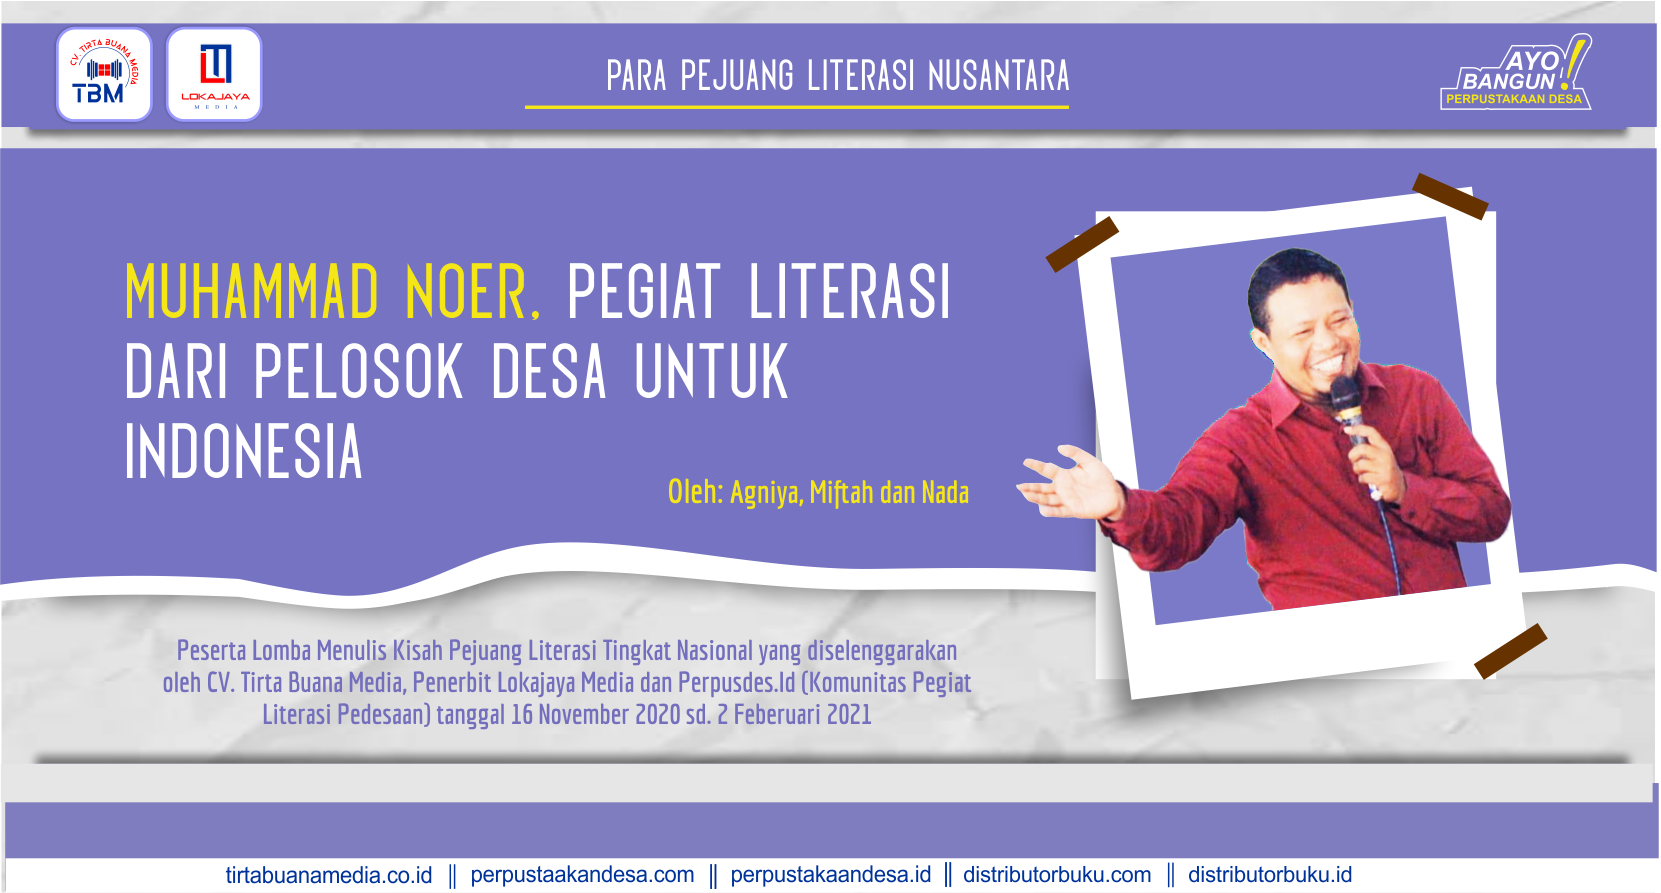 Muhammad Noer, Pegiat Literasi dari Pelosok Desa untuk Indonesia